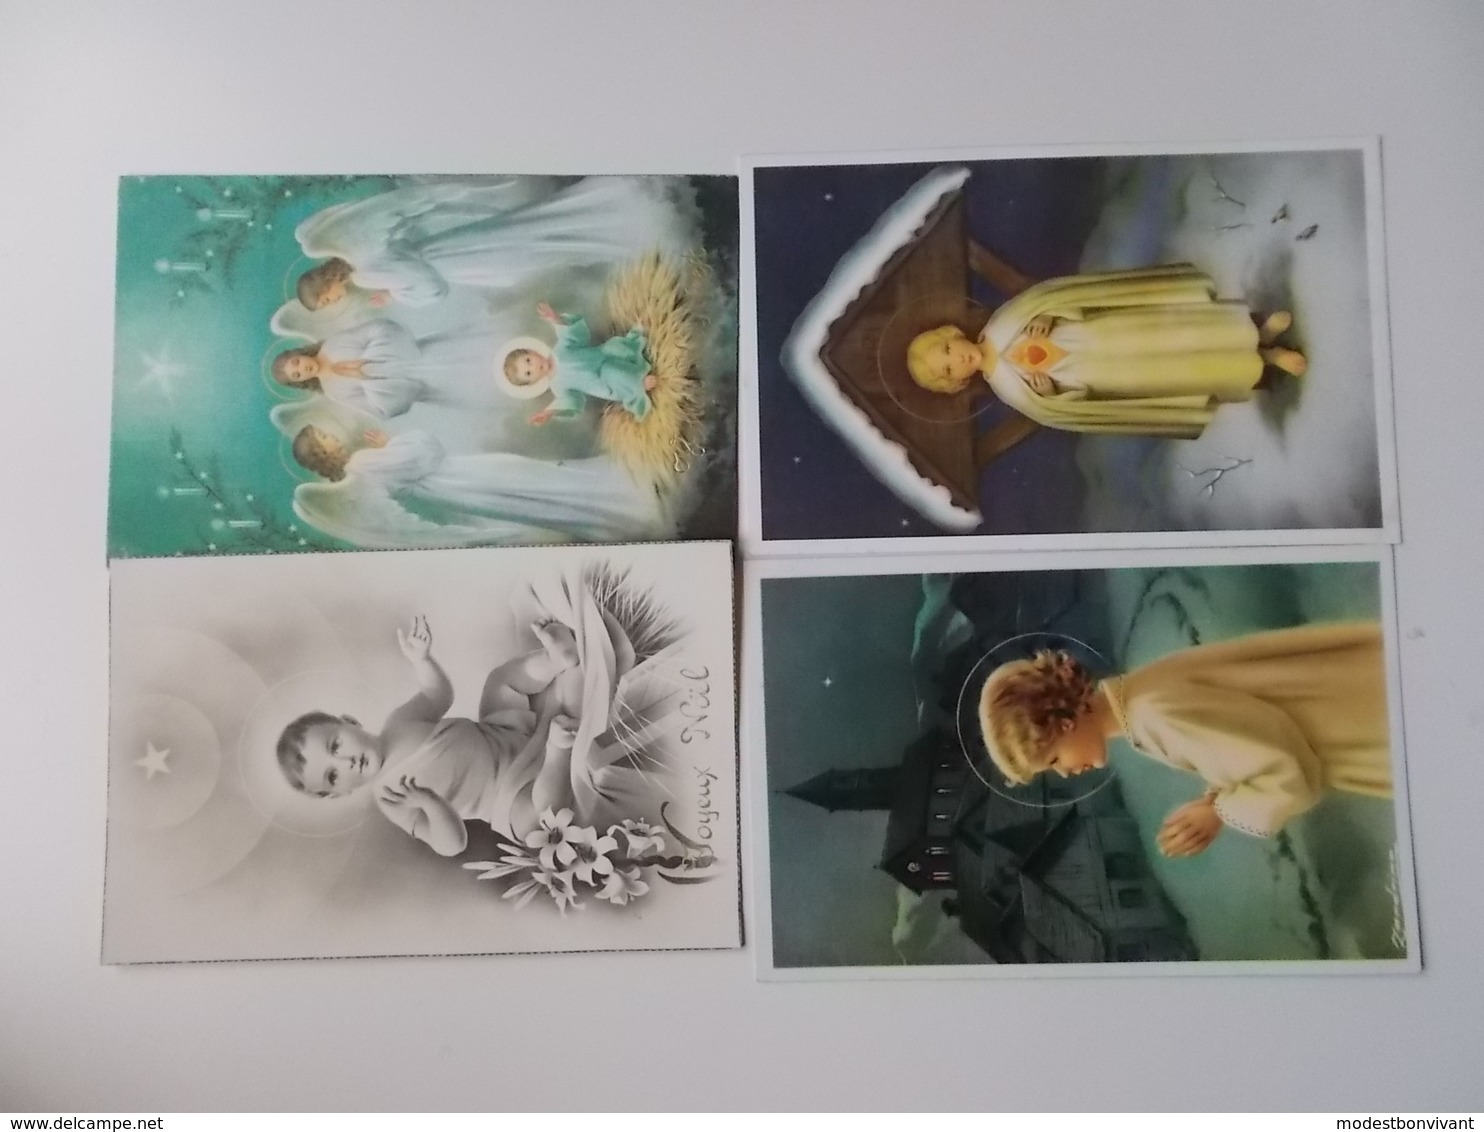 Lot 4 Vintage, Romantiek, Amitiès, Liefde, Amour, Begin 1900, Folklore, Wensen, Bloemen,  JOYEUX NOËL./ KERST.... # 13 - Fantasia